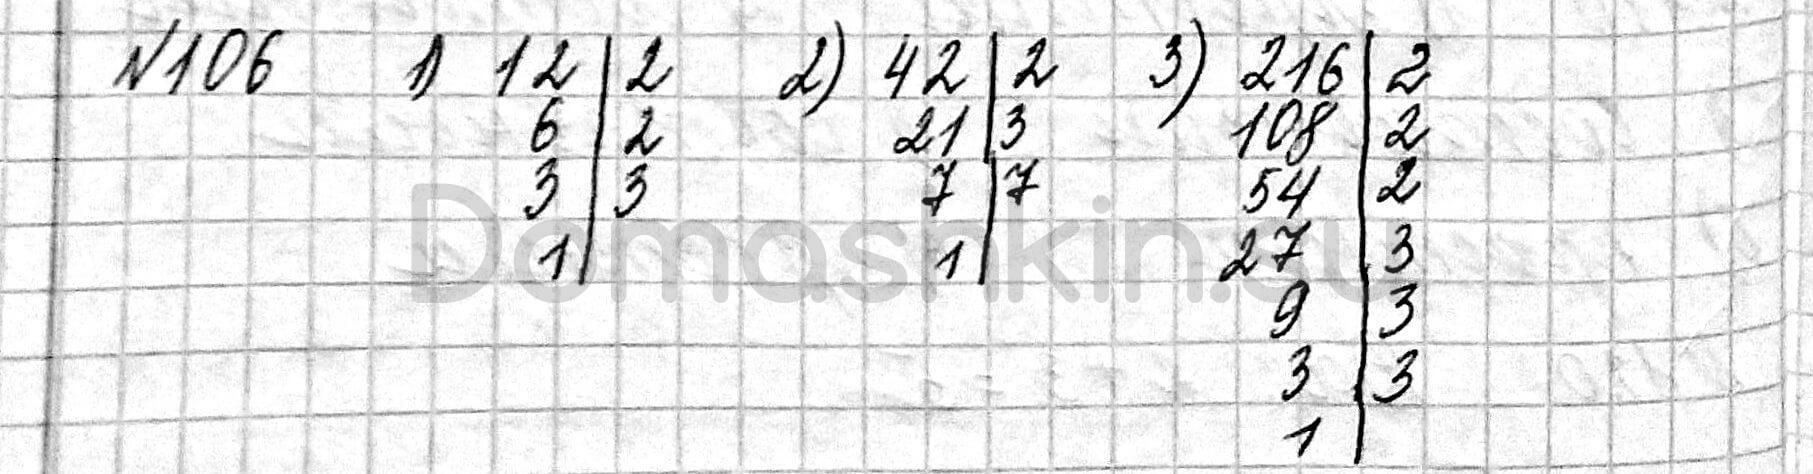 Математика 6 класс учебник Мерзляк номер 106 решение